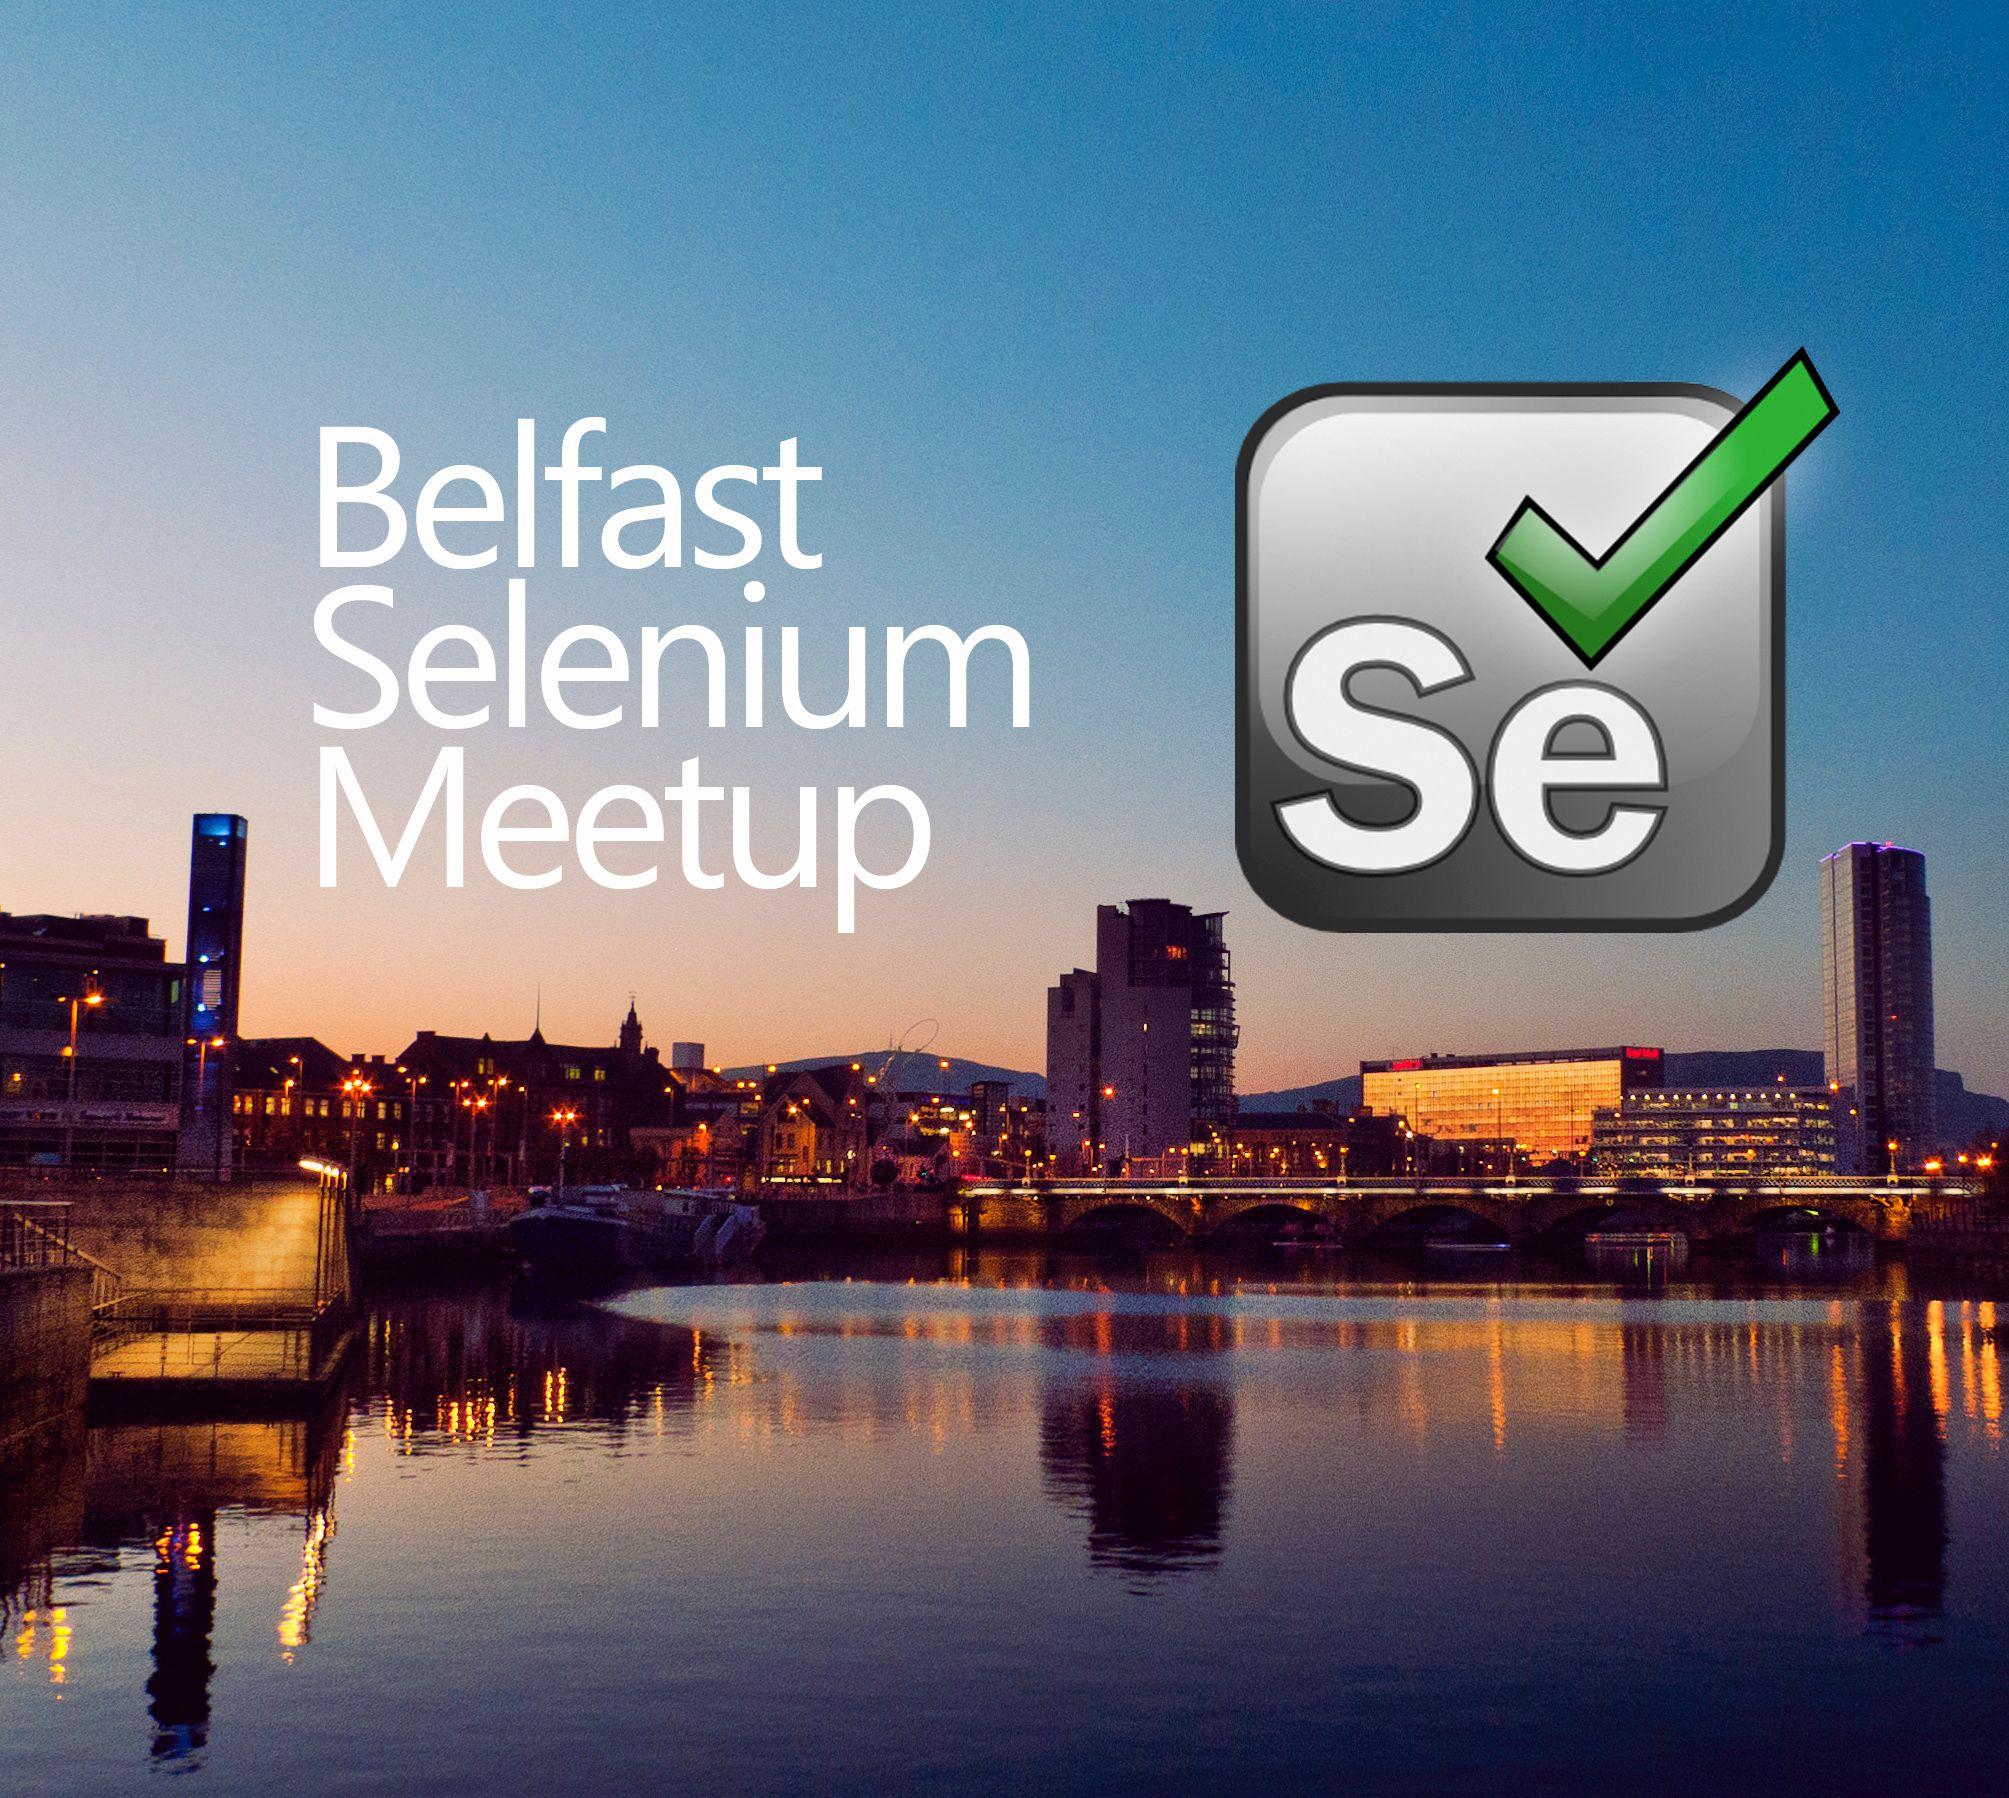 Belfast Selenium Meetup Group